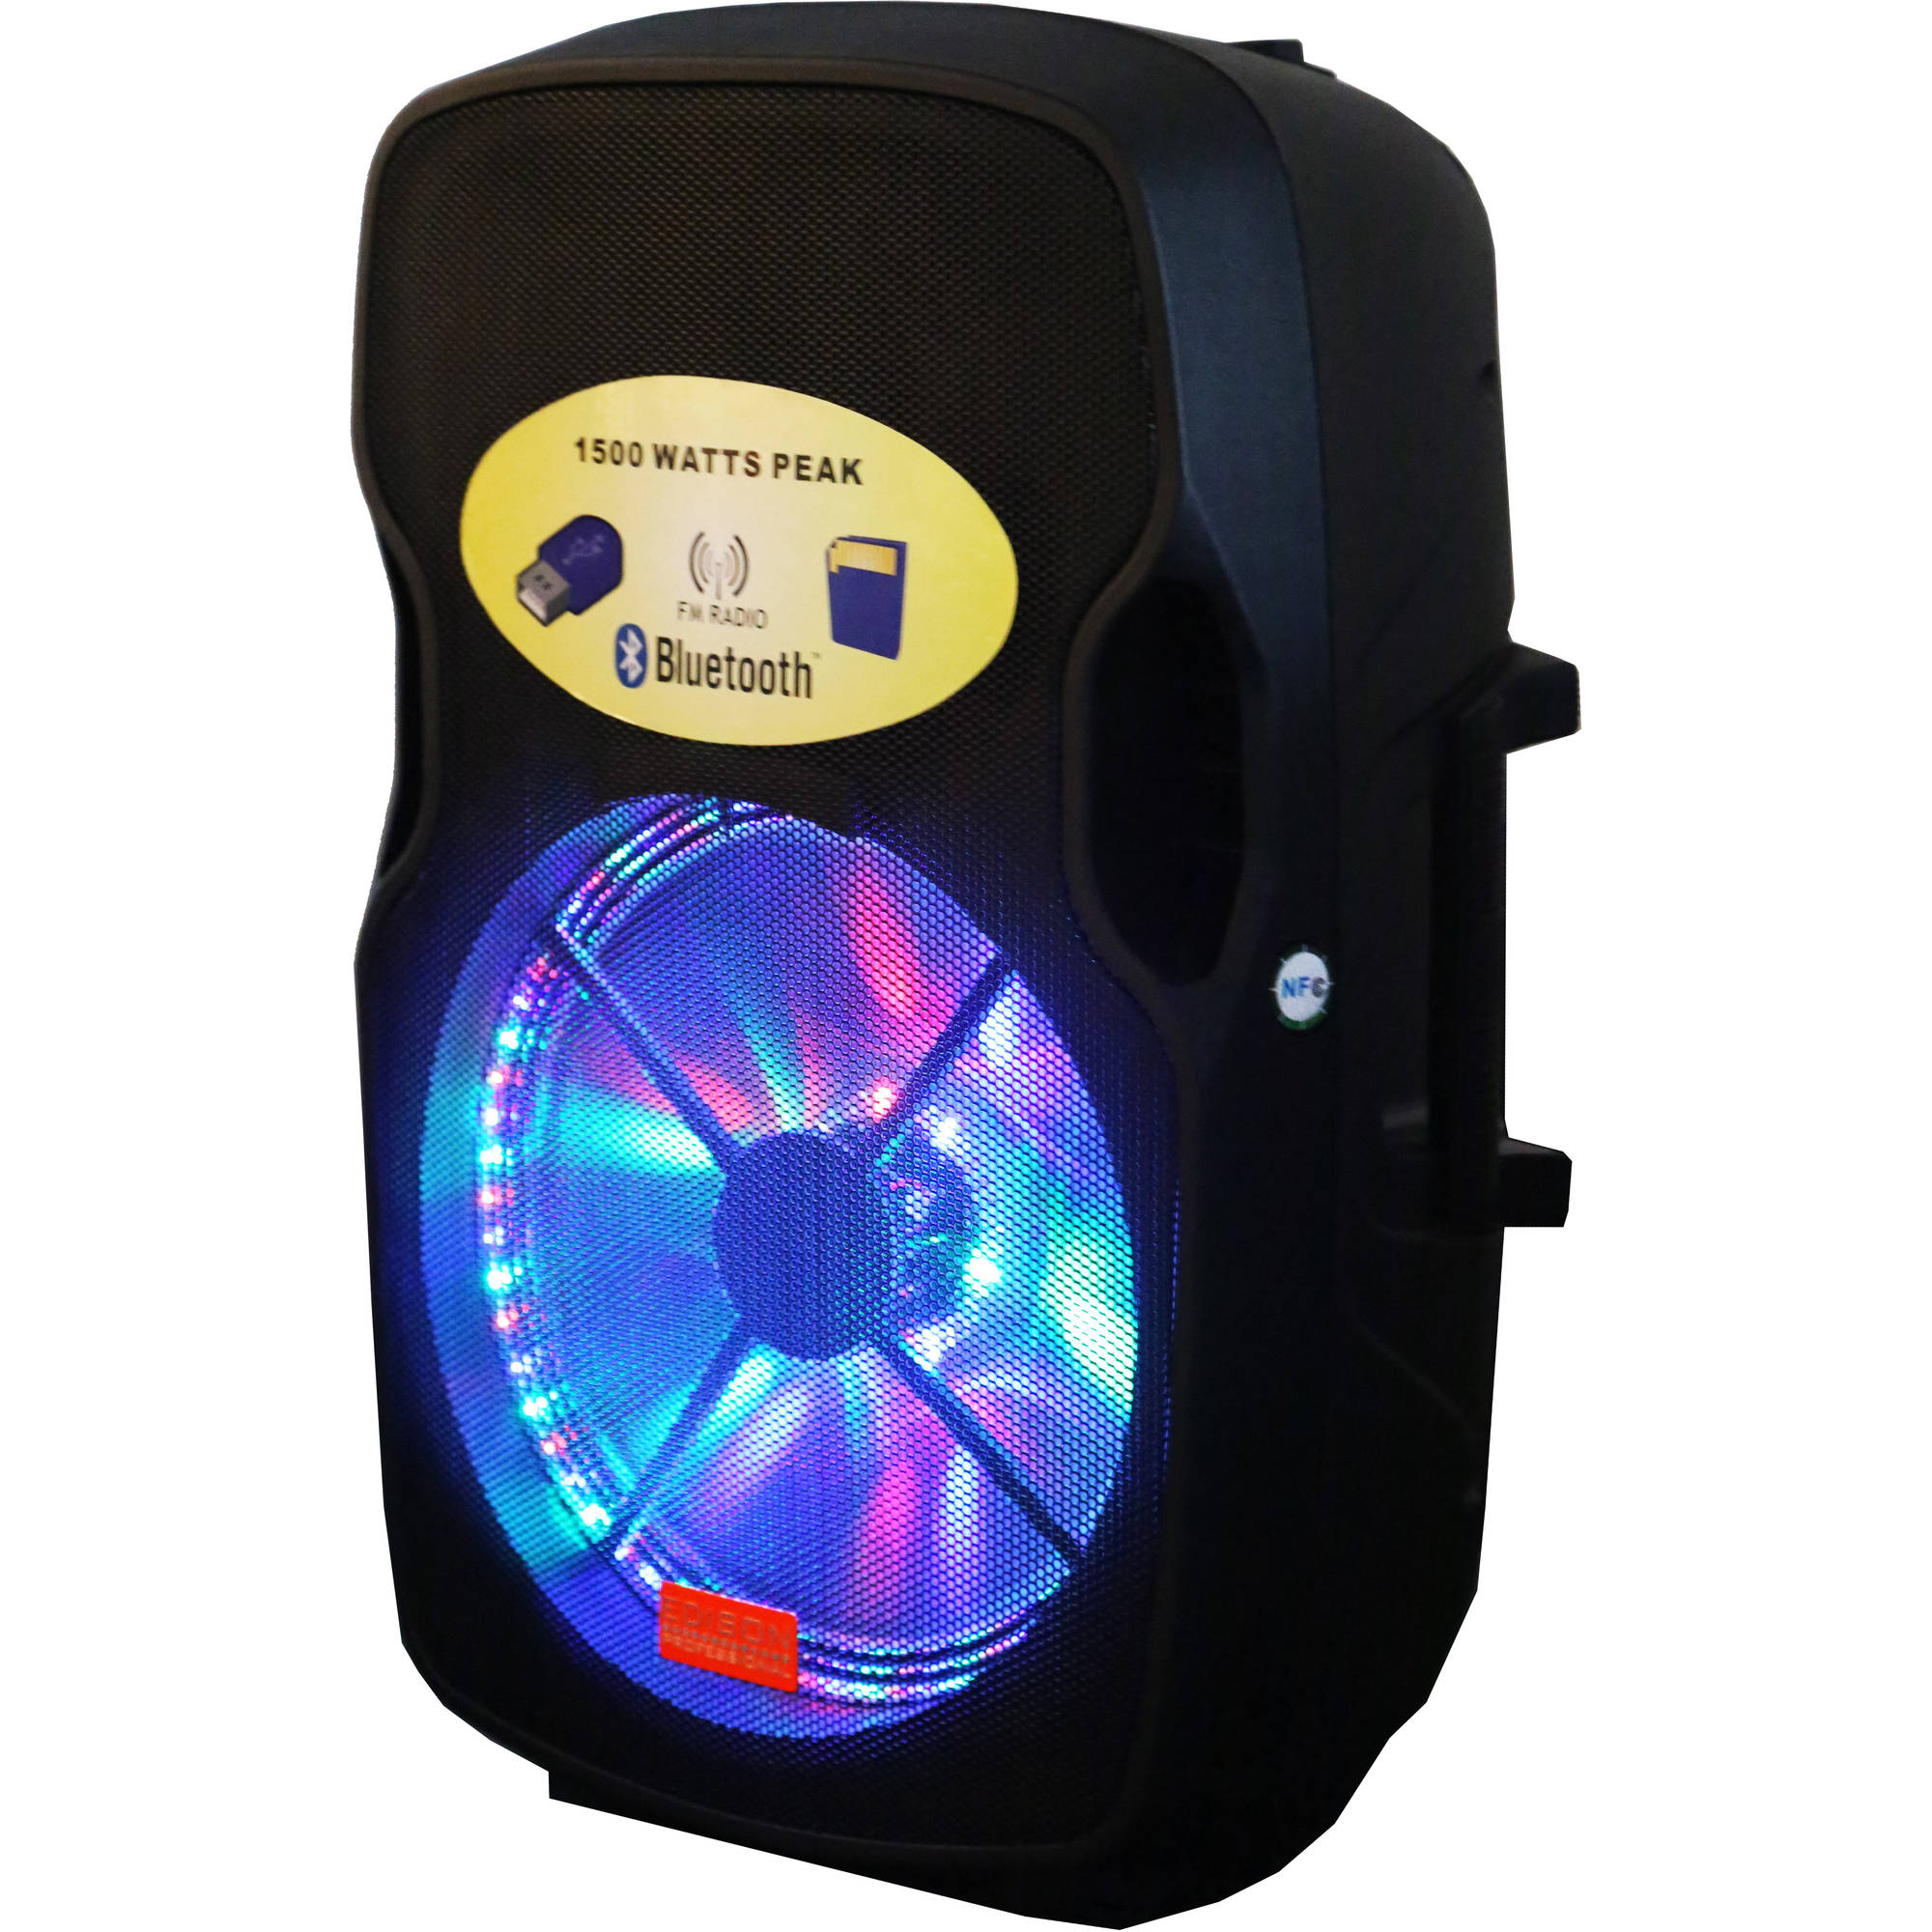 Britelite Edison Professional EN-1500 Bluetooth Wireless Speaker by Edison Professional